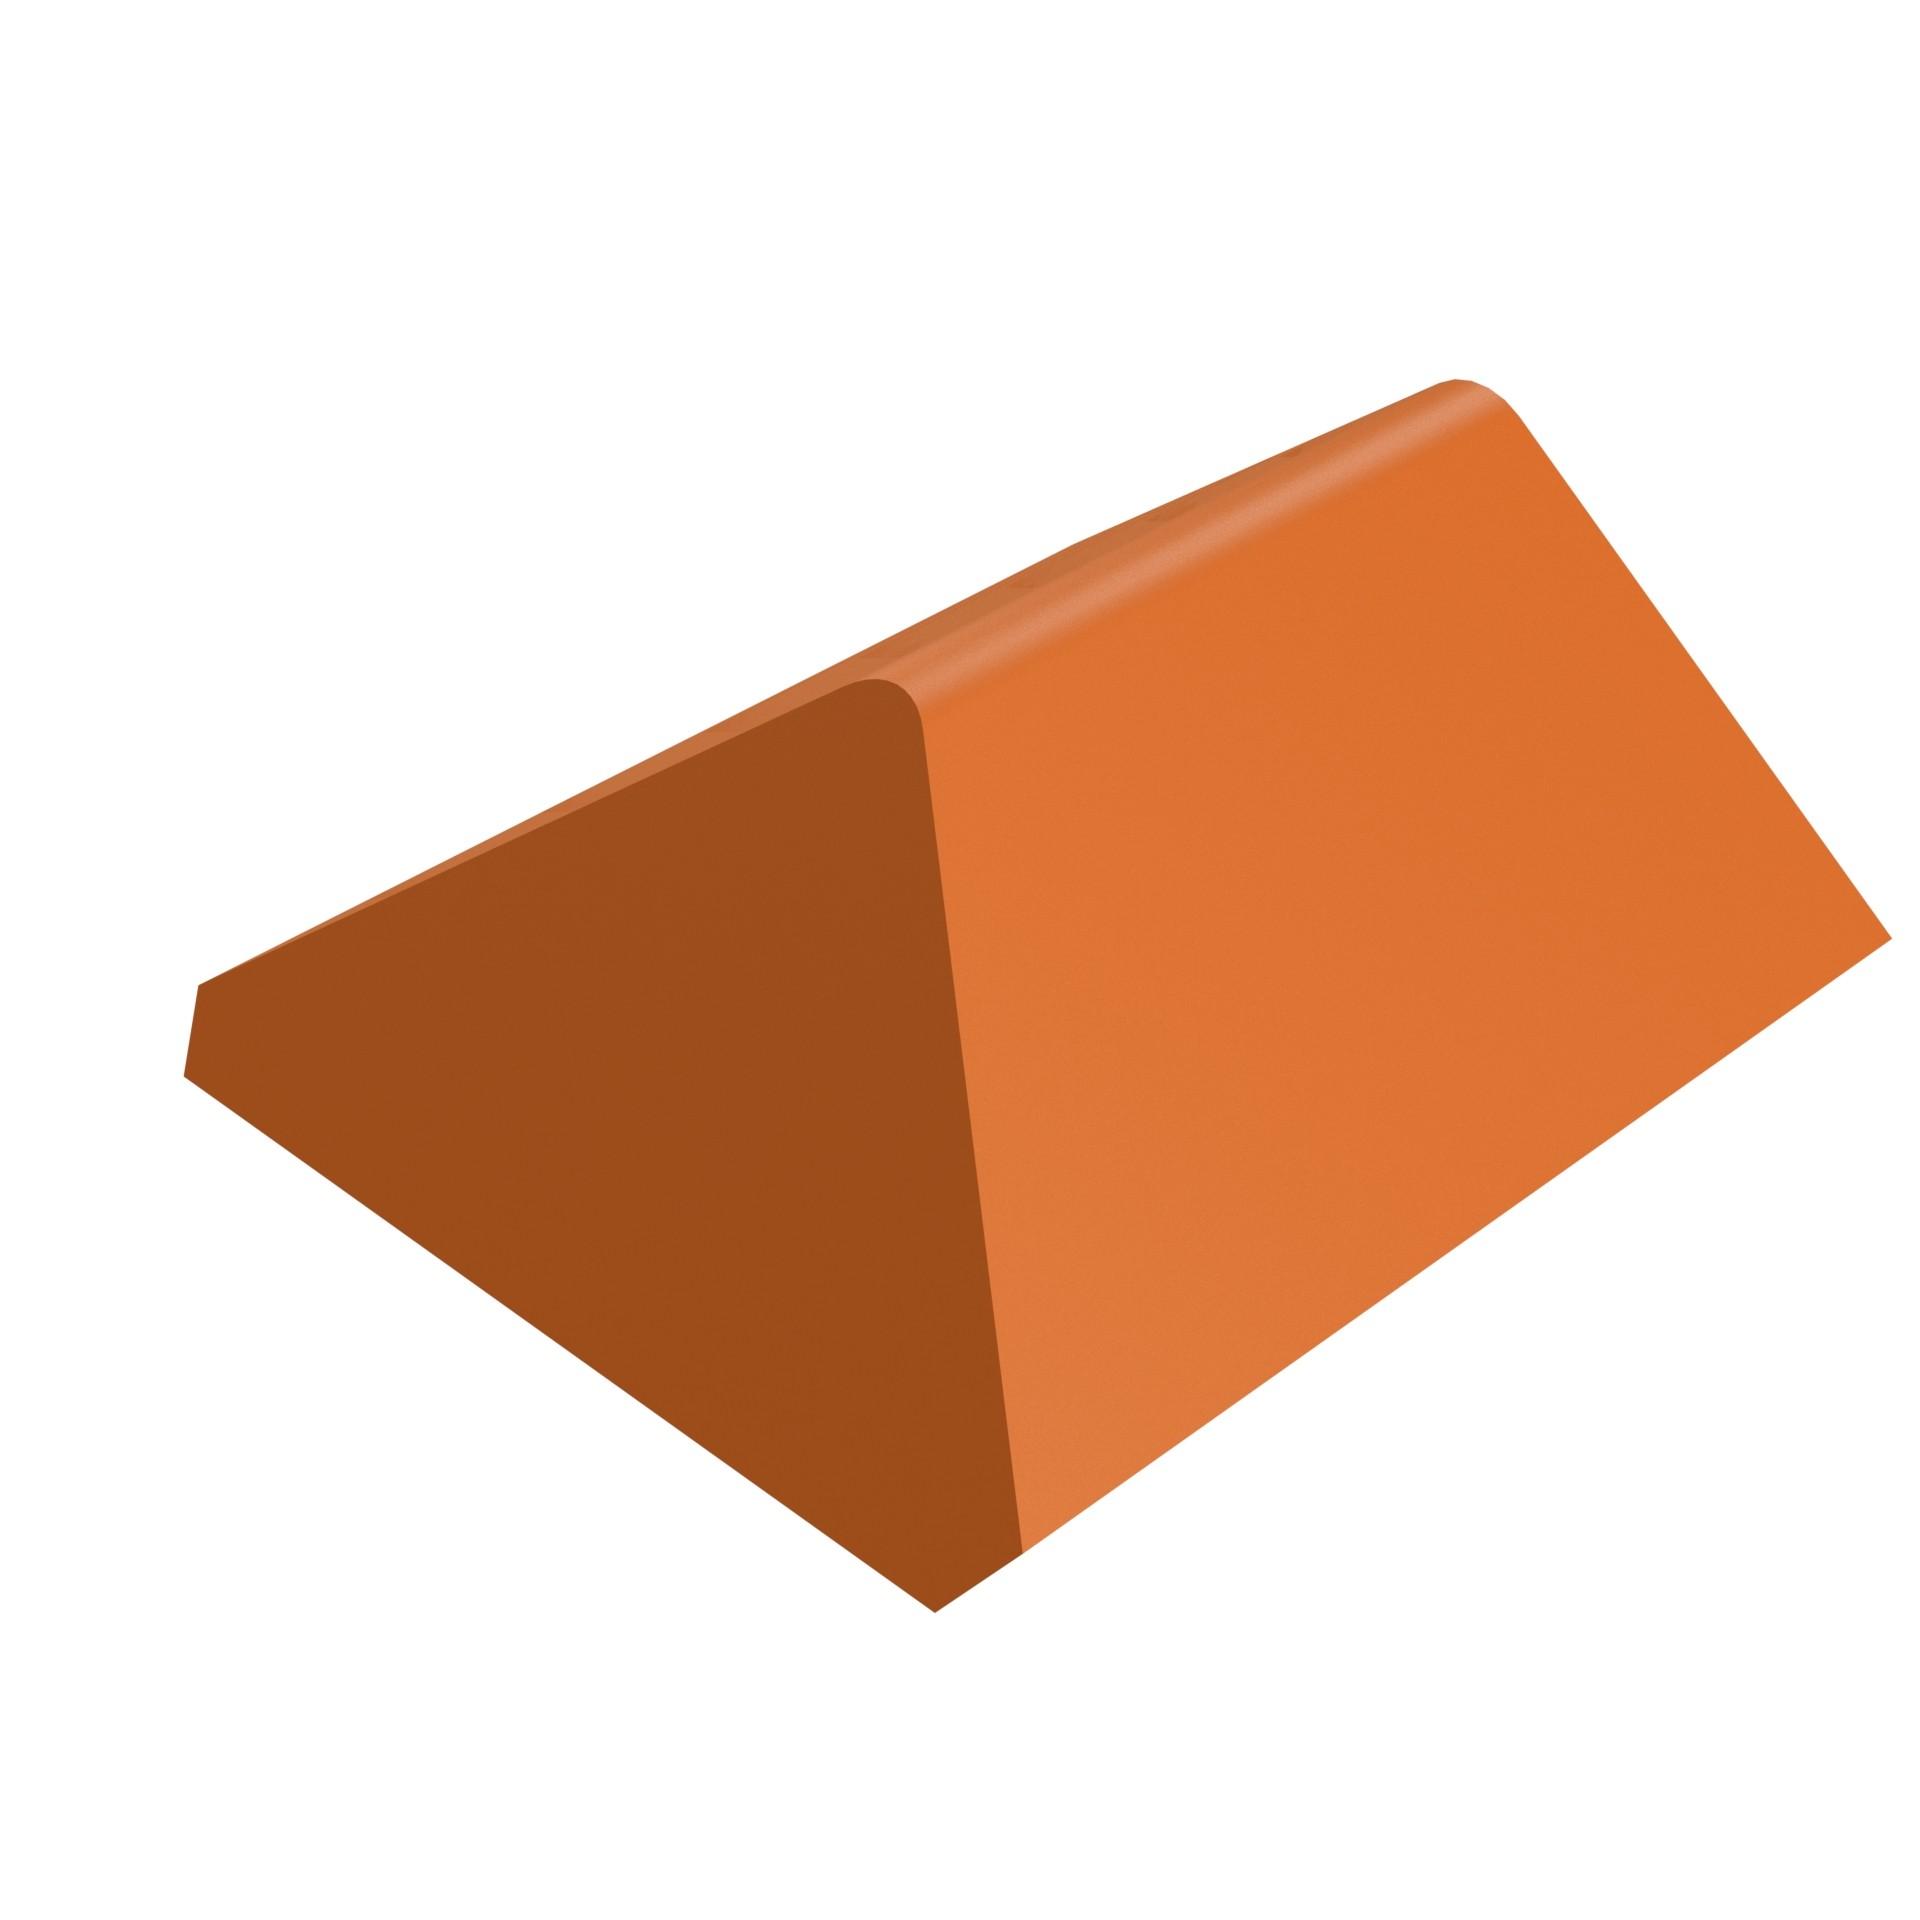 SANDTOFT TILES - Clay Angle Ridge With Hip End